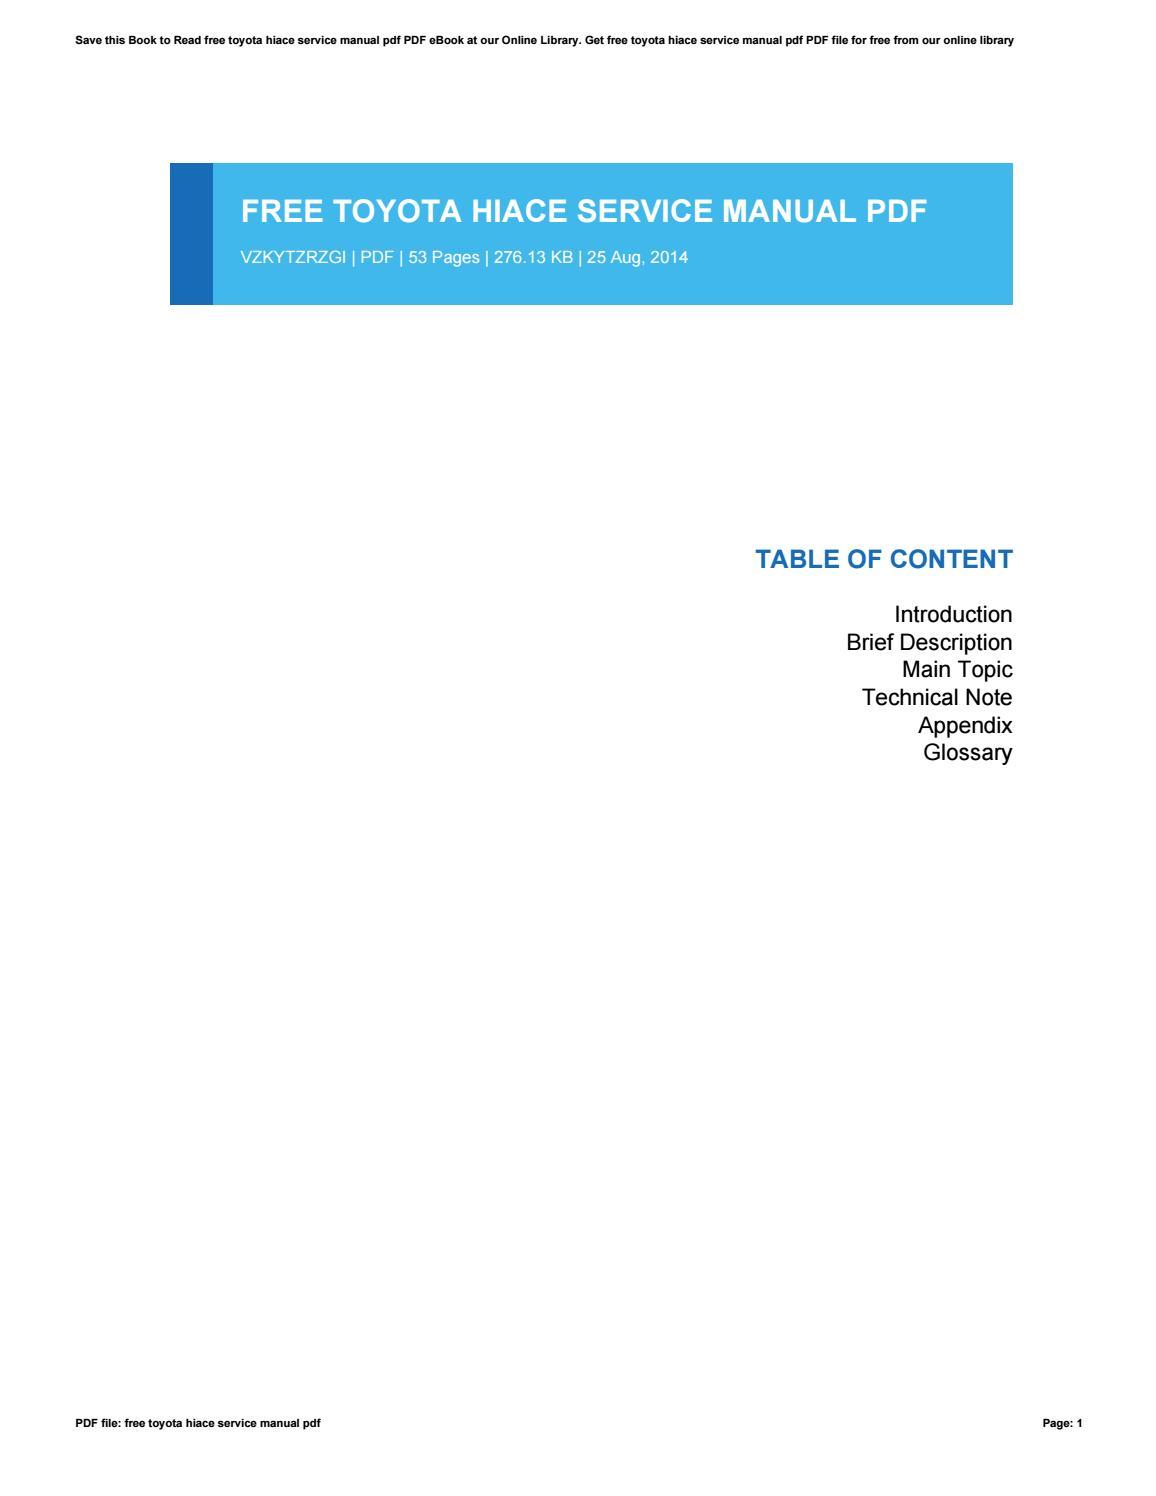 Toyota Hiace Service EBook @ 42.885.valentinidavide.com